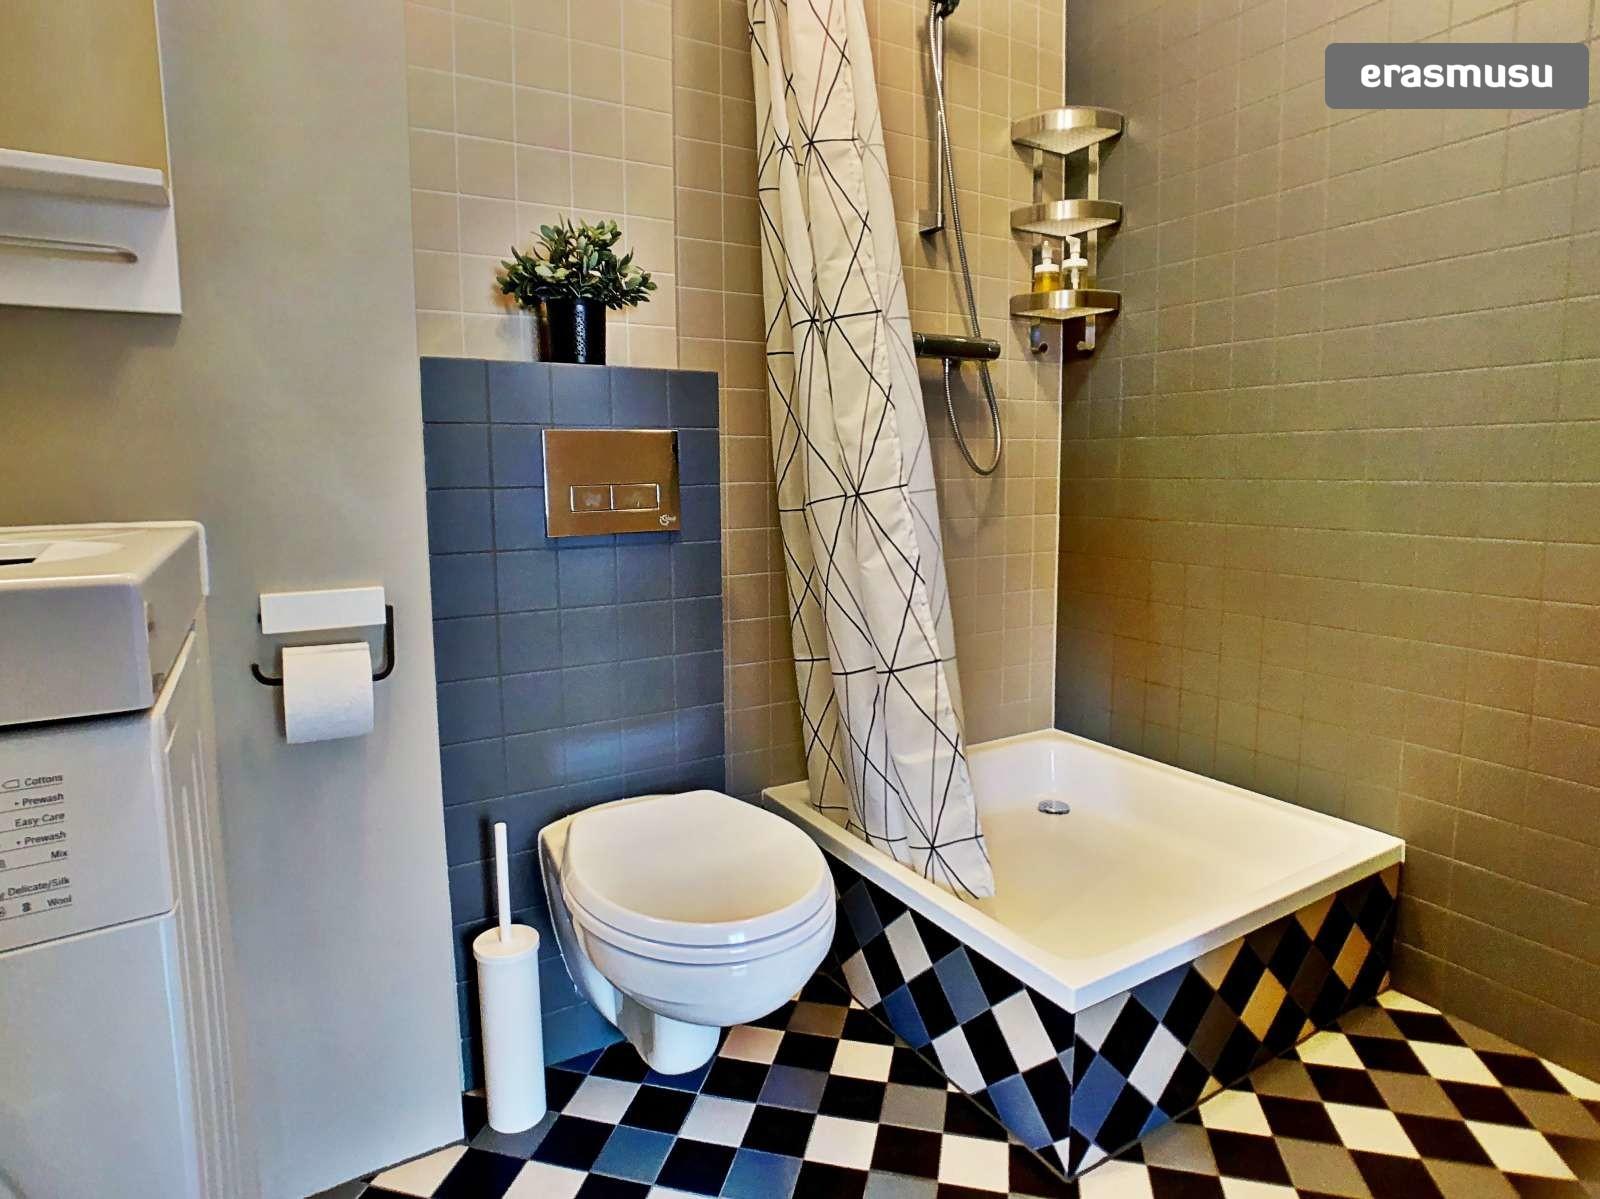 stylish-studio-apartment-rent-grizinkalns-3c939bf070da2ff8a0af3e